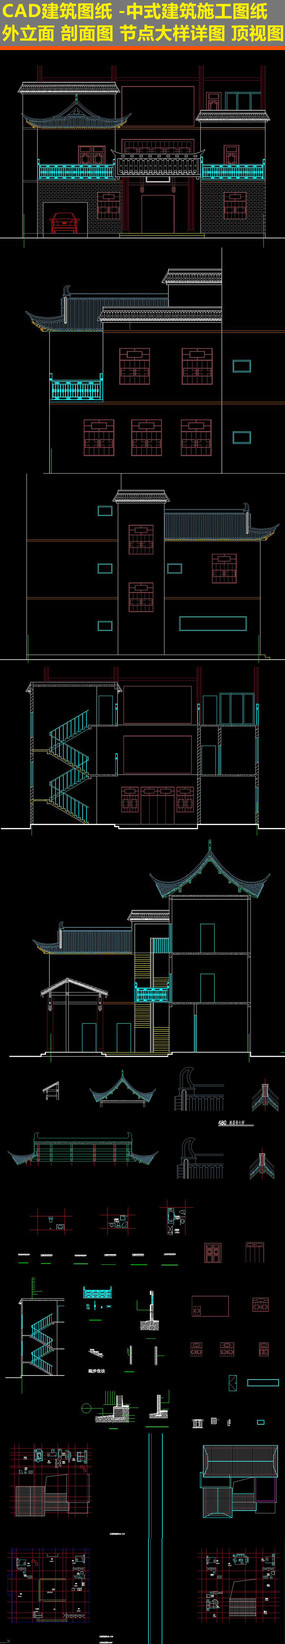 CAD中式建筑施工图节点大样